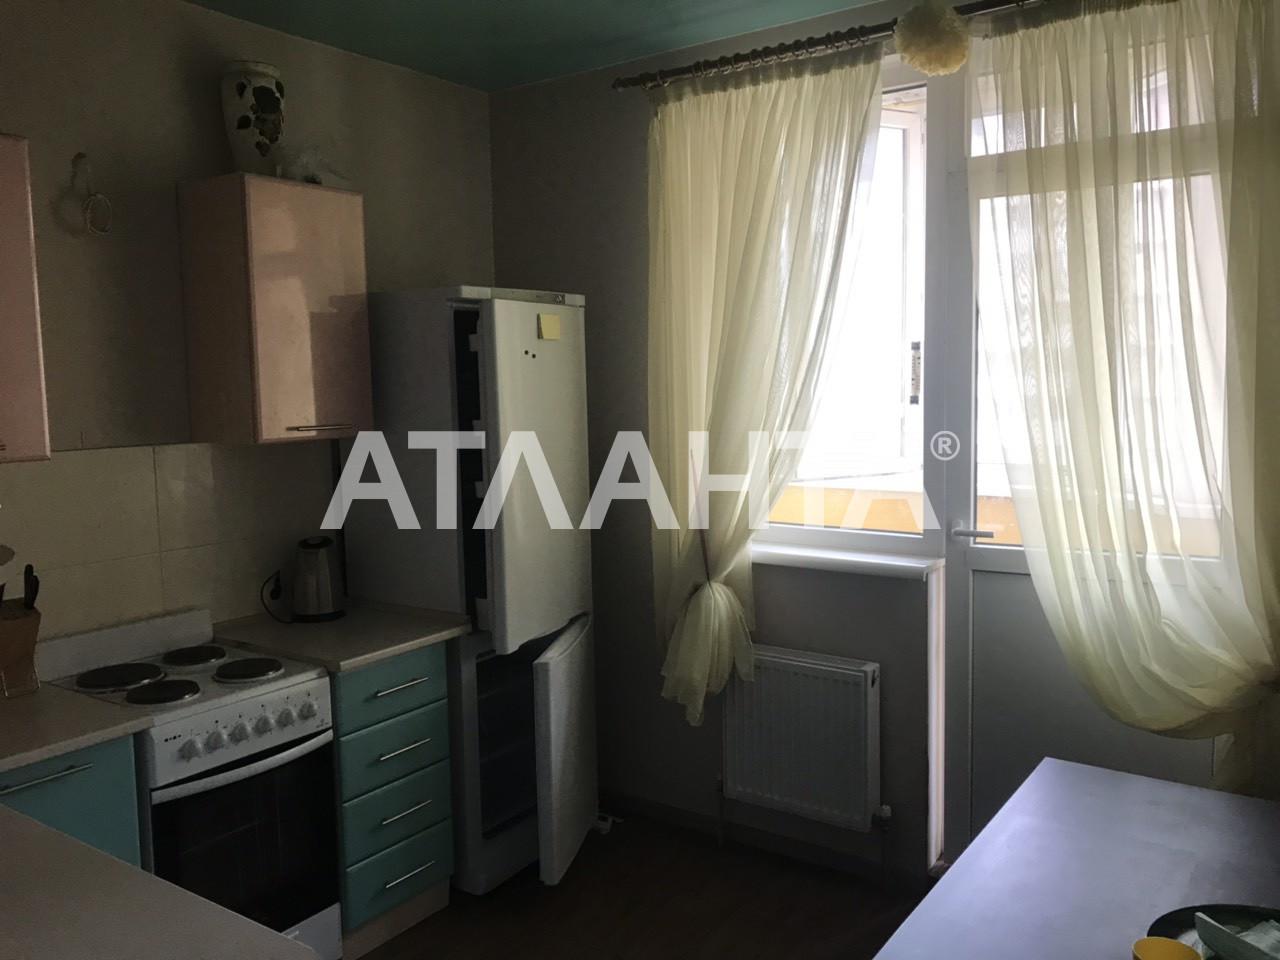 Продается 1-комнатная Квартира на ул. Радужный М-Н — 36 500 у.е. (фото №3)